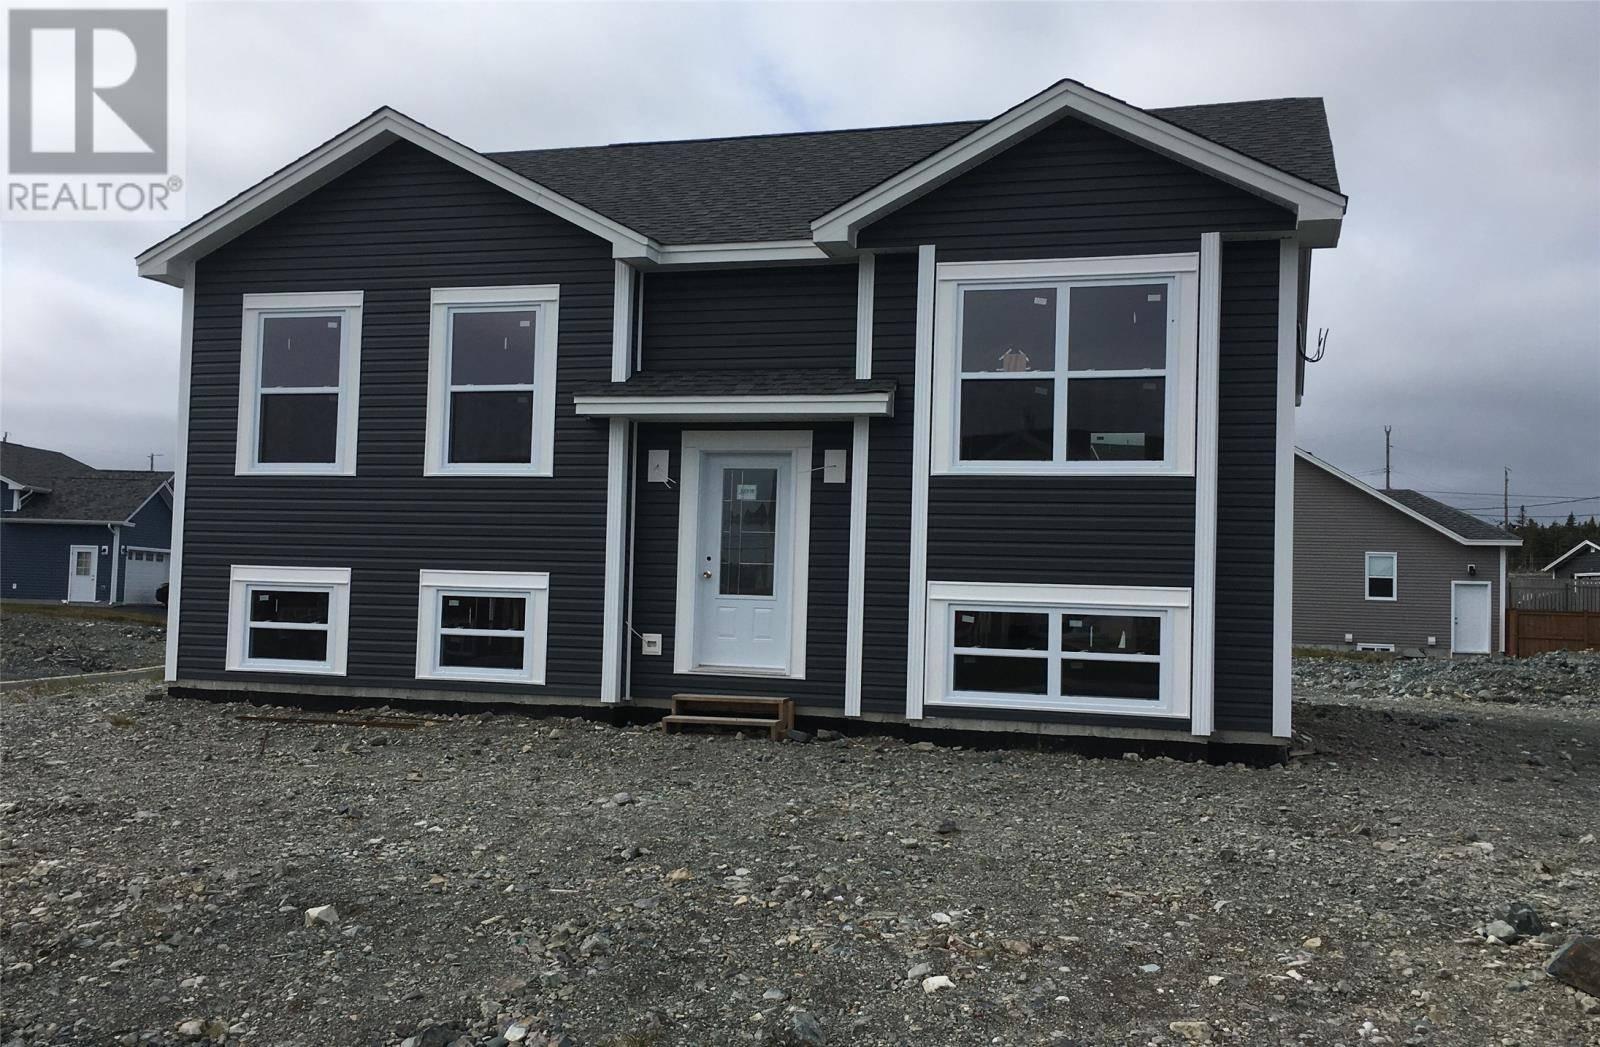 House for sale at 11 Orlando Pl St. John's Newfoundland - MLS: 1200575